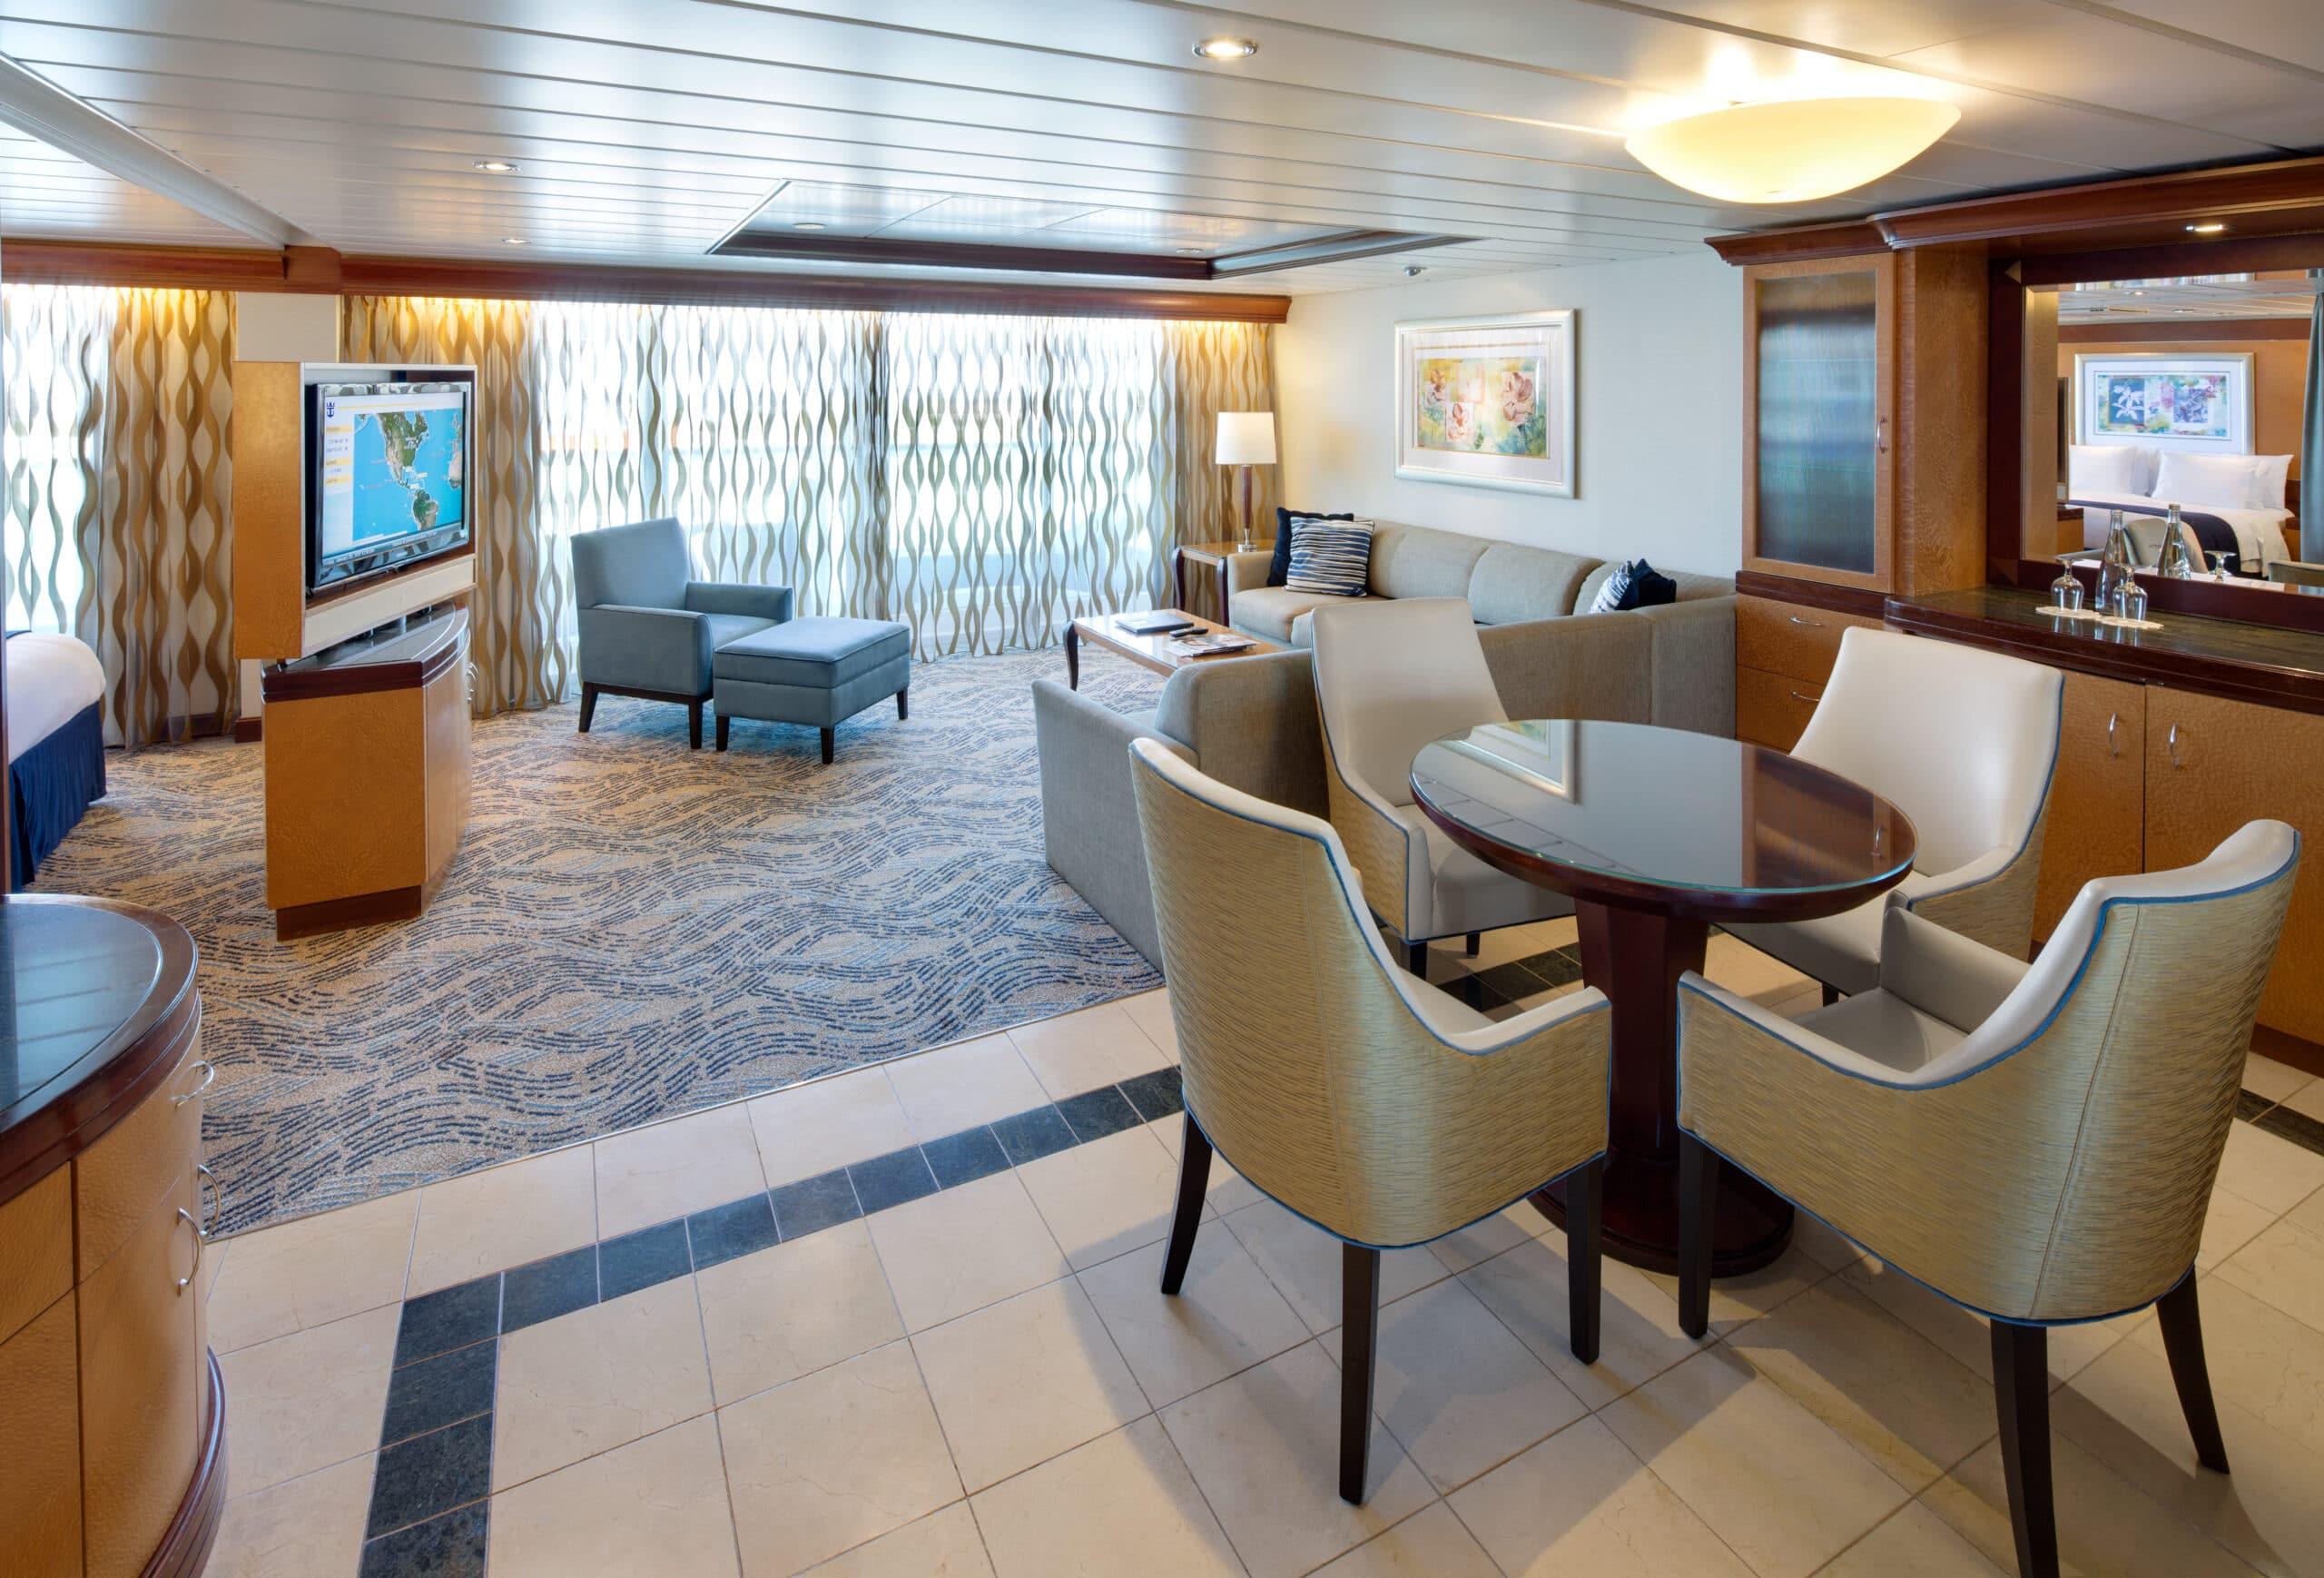 Royal-Caribbean-International-Navigator-of-the-Seas-Voyager-of-the-Seas-schip-cruiseschip-categorie-OS-Owner-Suite